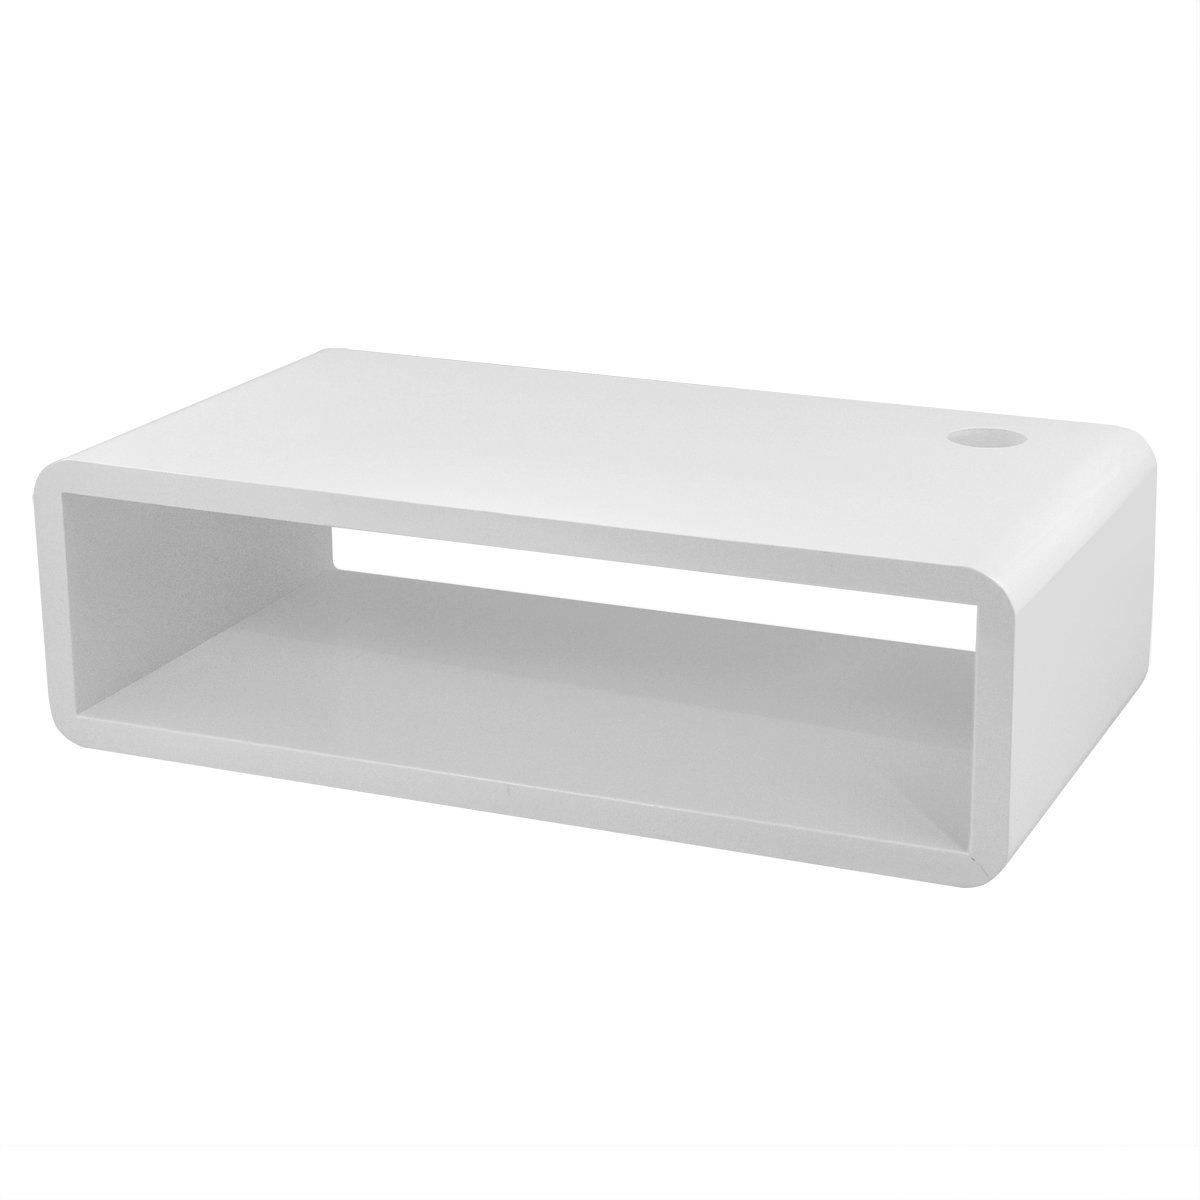 black white red floating wall mount shelf cube sky box dvd hifi unit shelf ebay. Black Bedroom Furniture Sets. Home Design Ideas